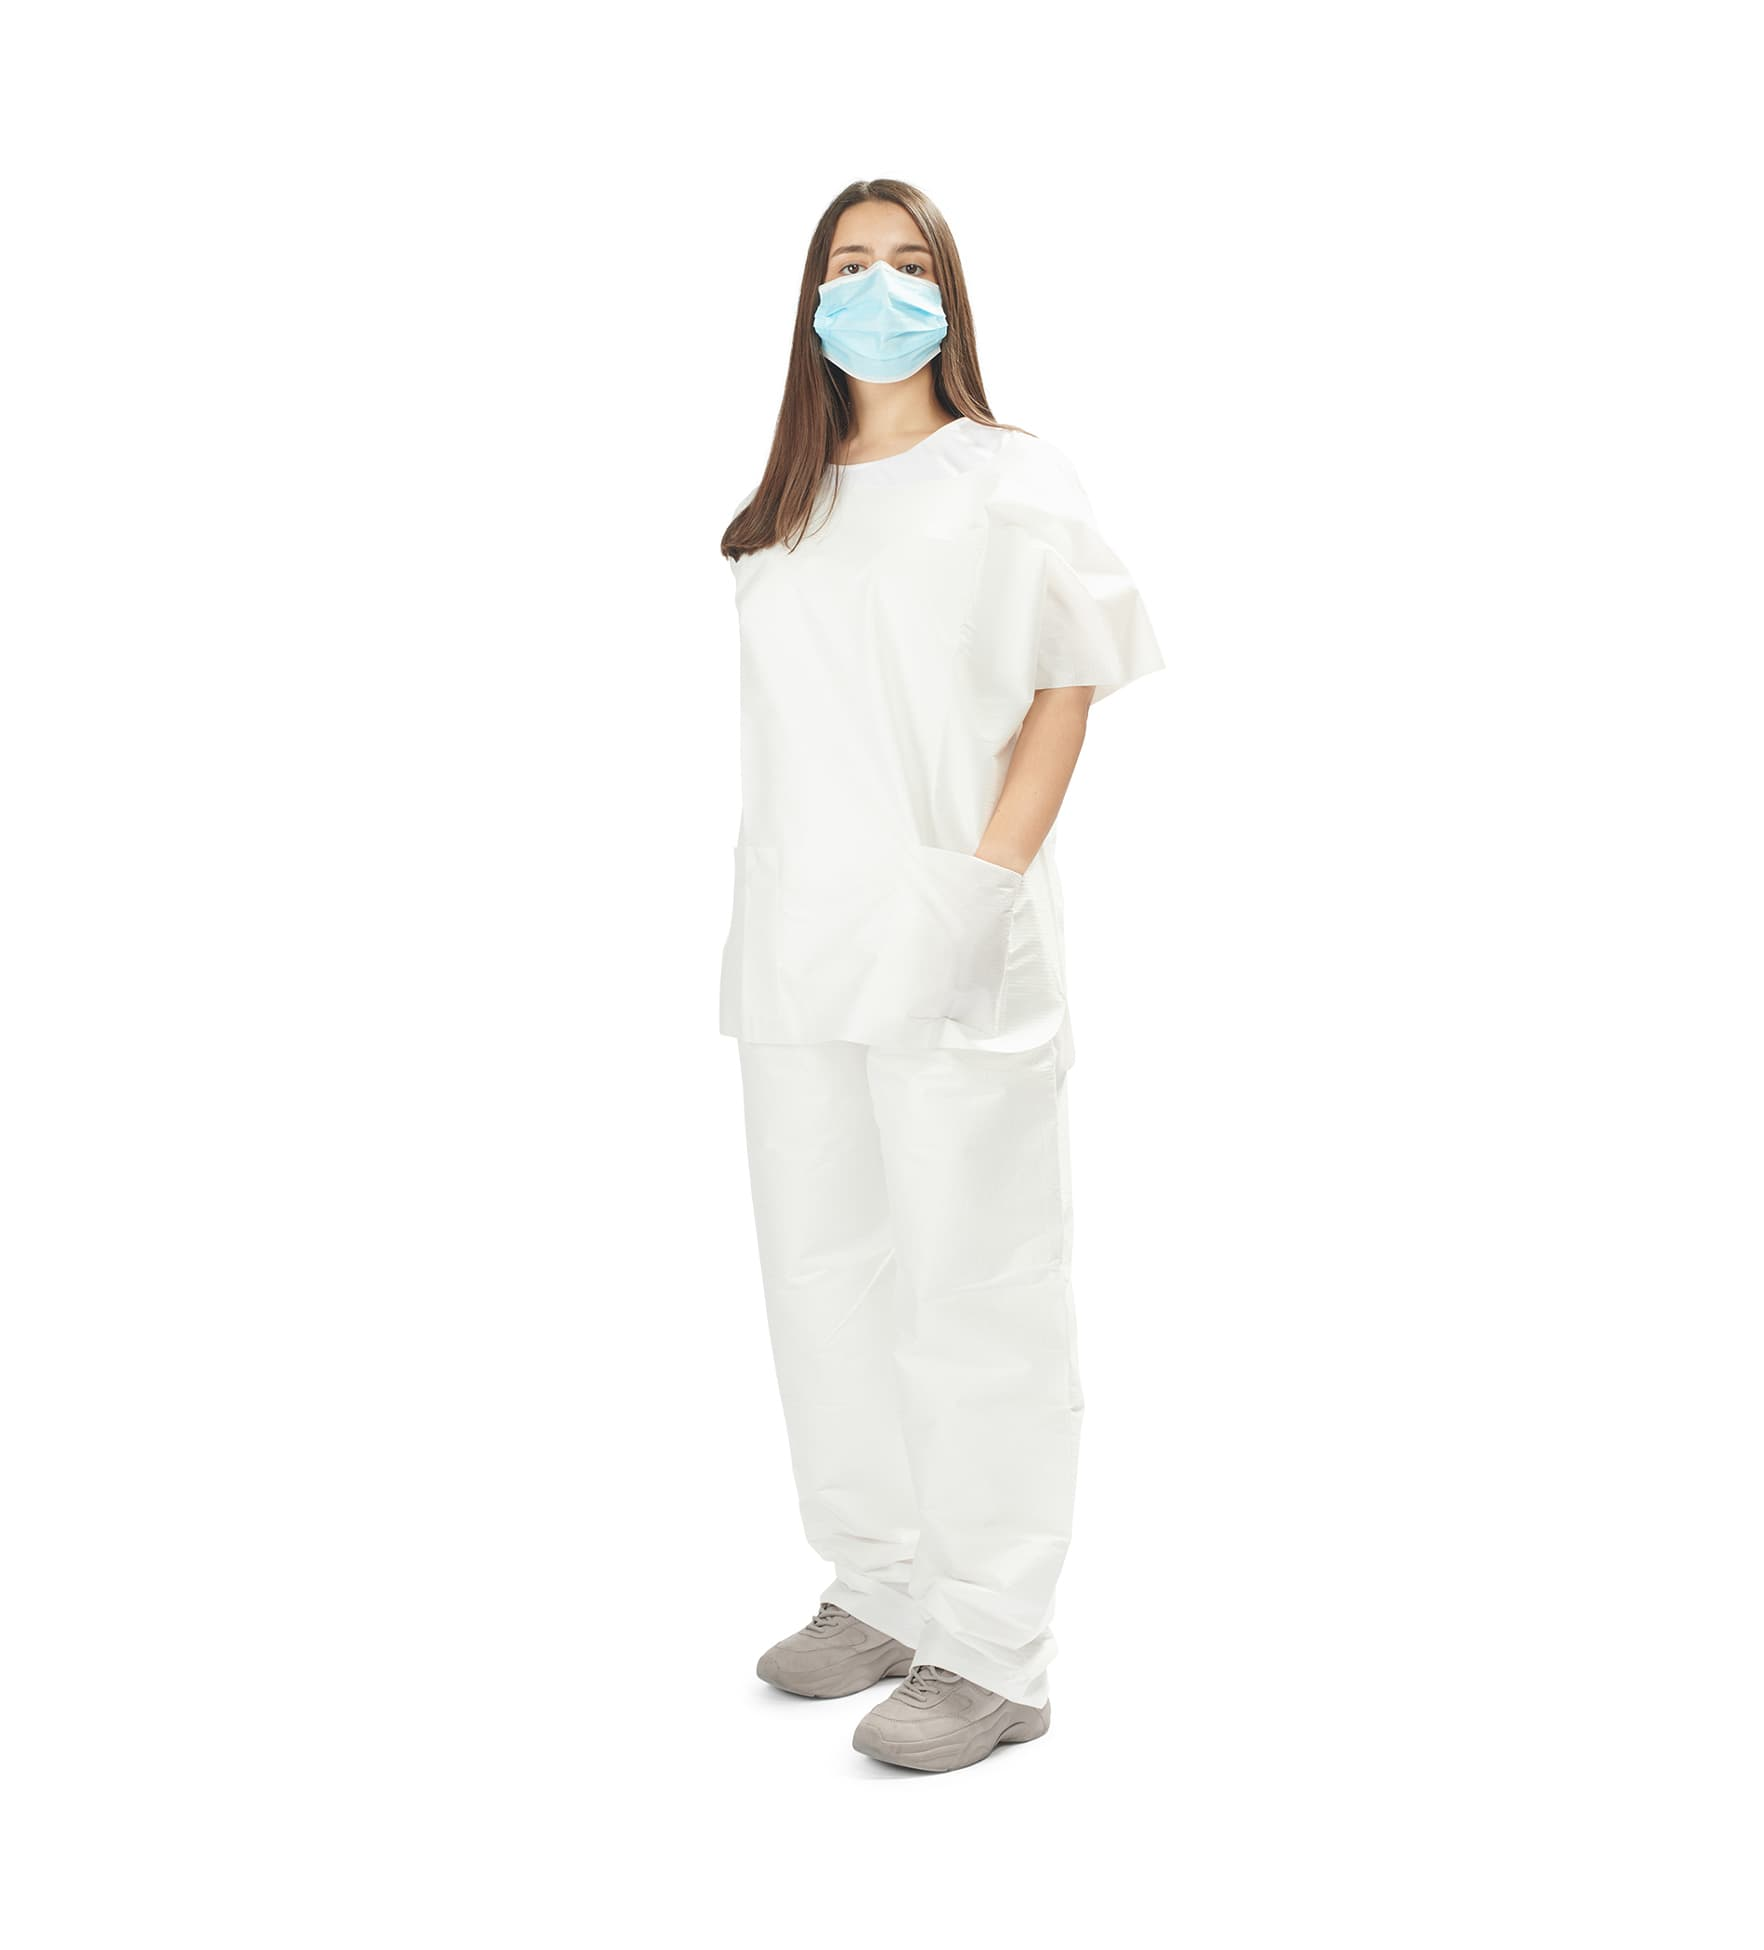 fardas de bloco hidrófugas 1 - water repellent scrubs - clothe protect